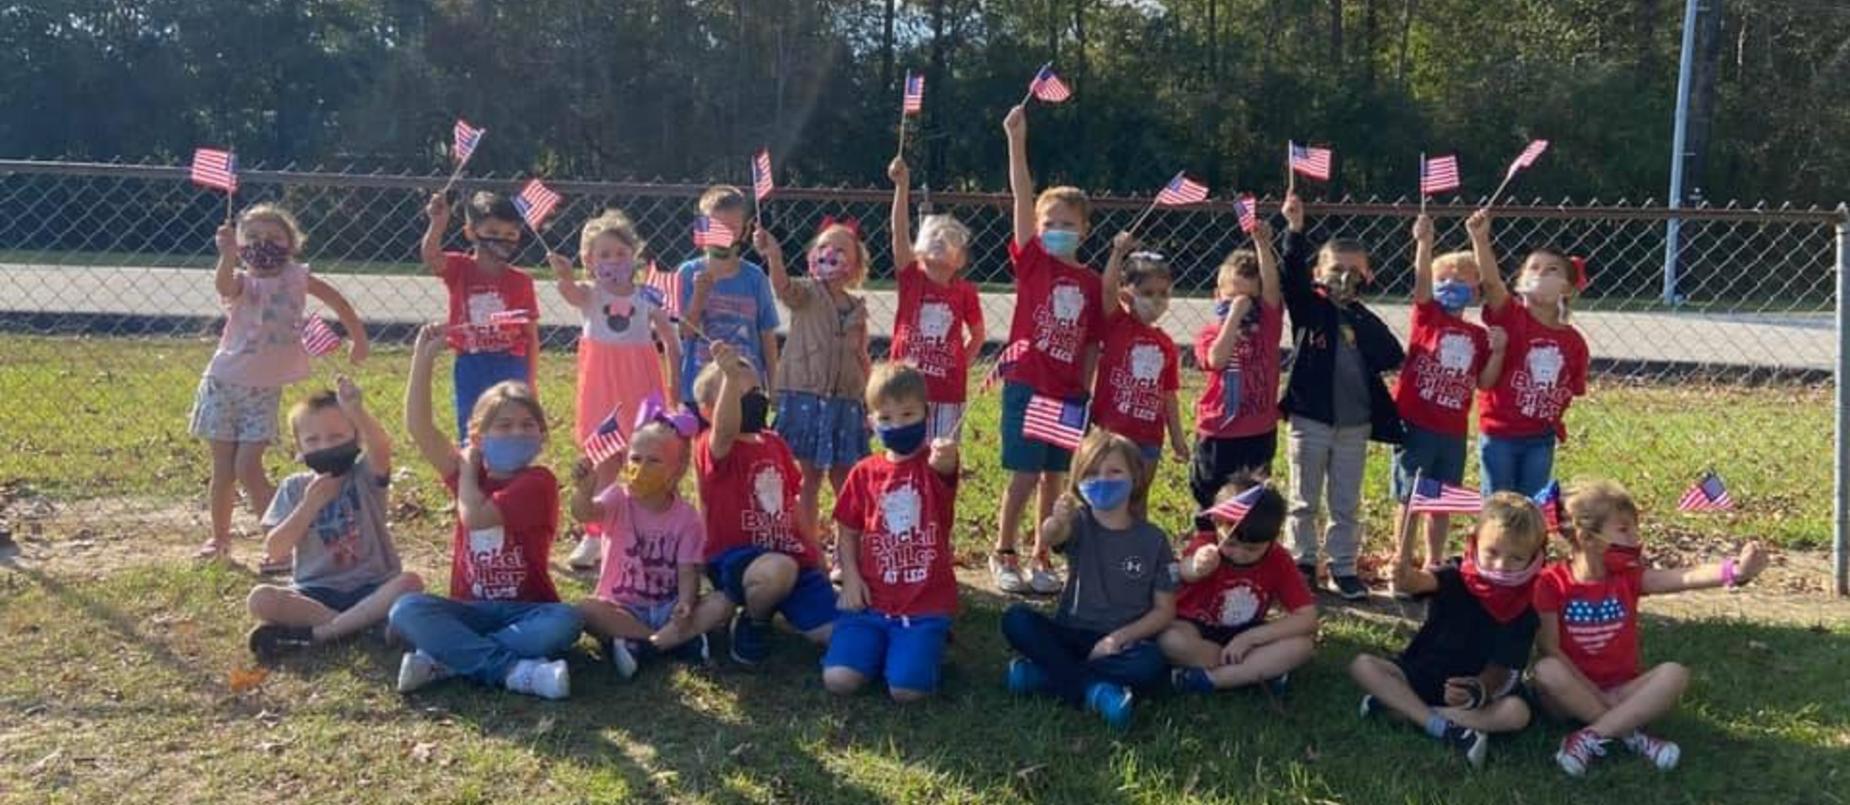 Early Childhood students waving US flag